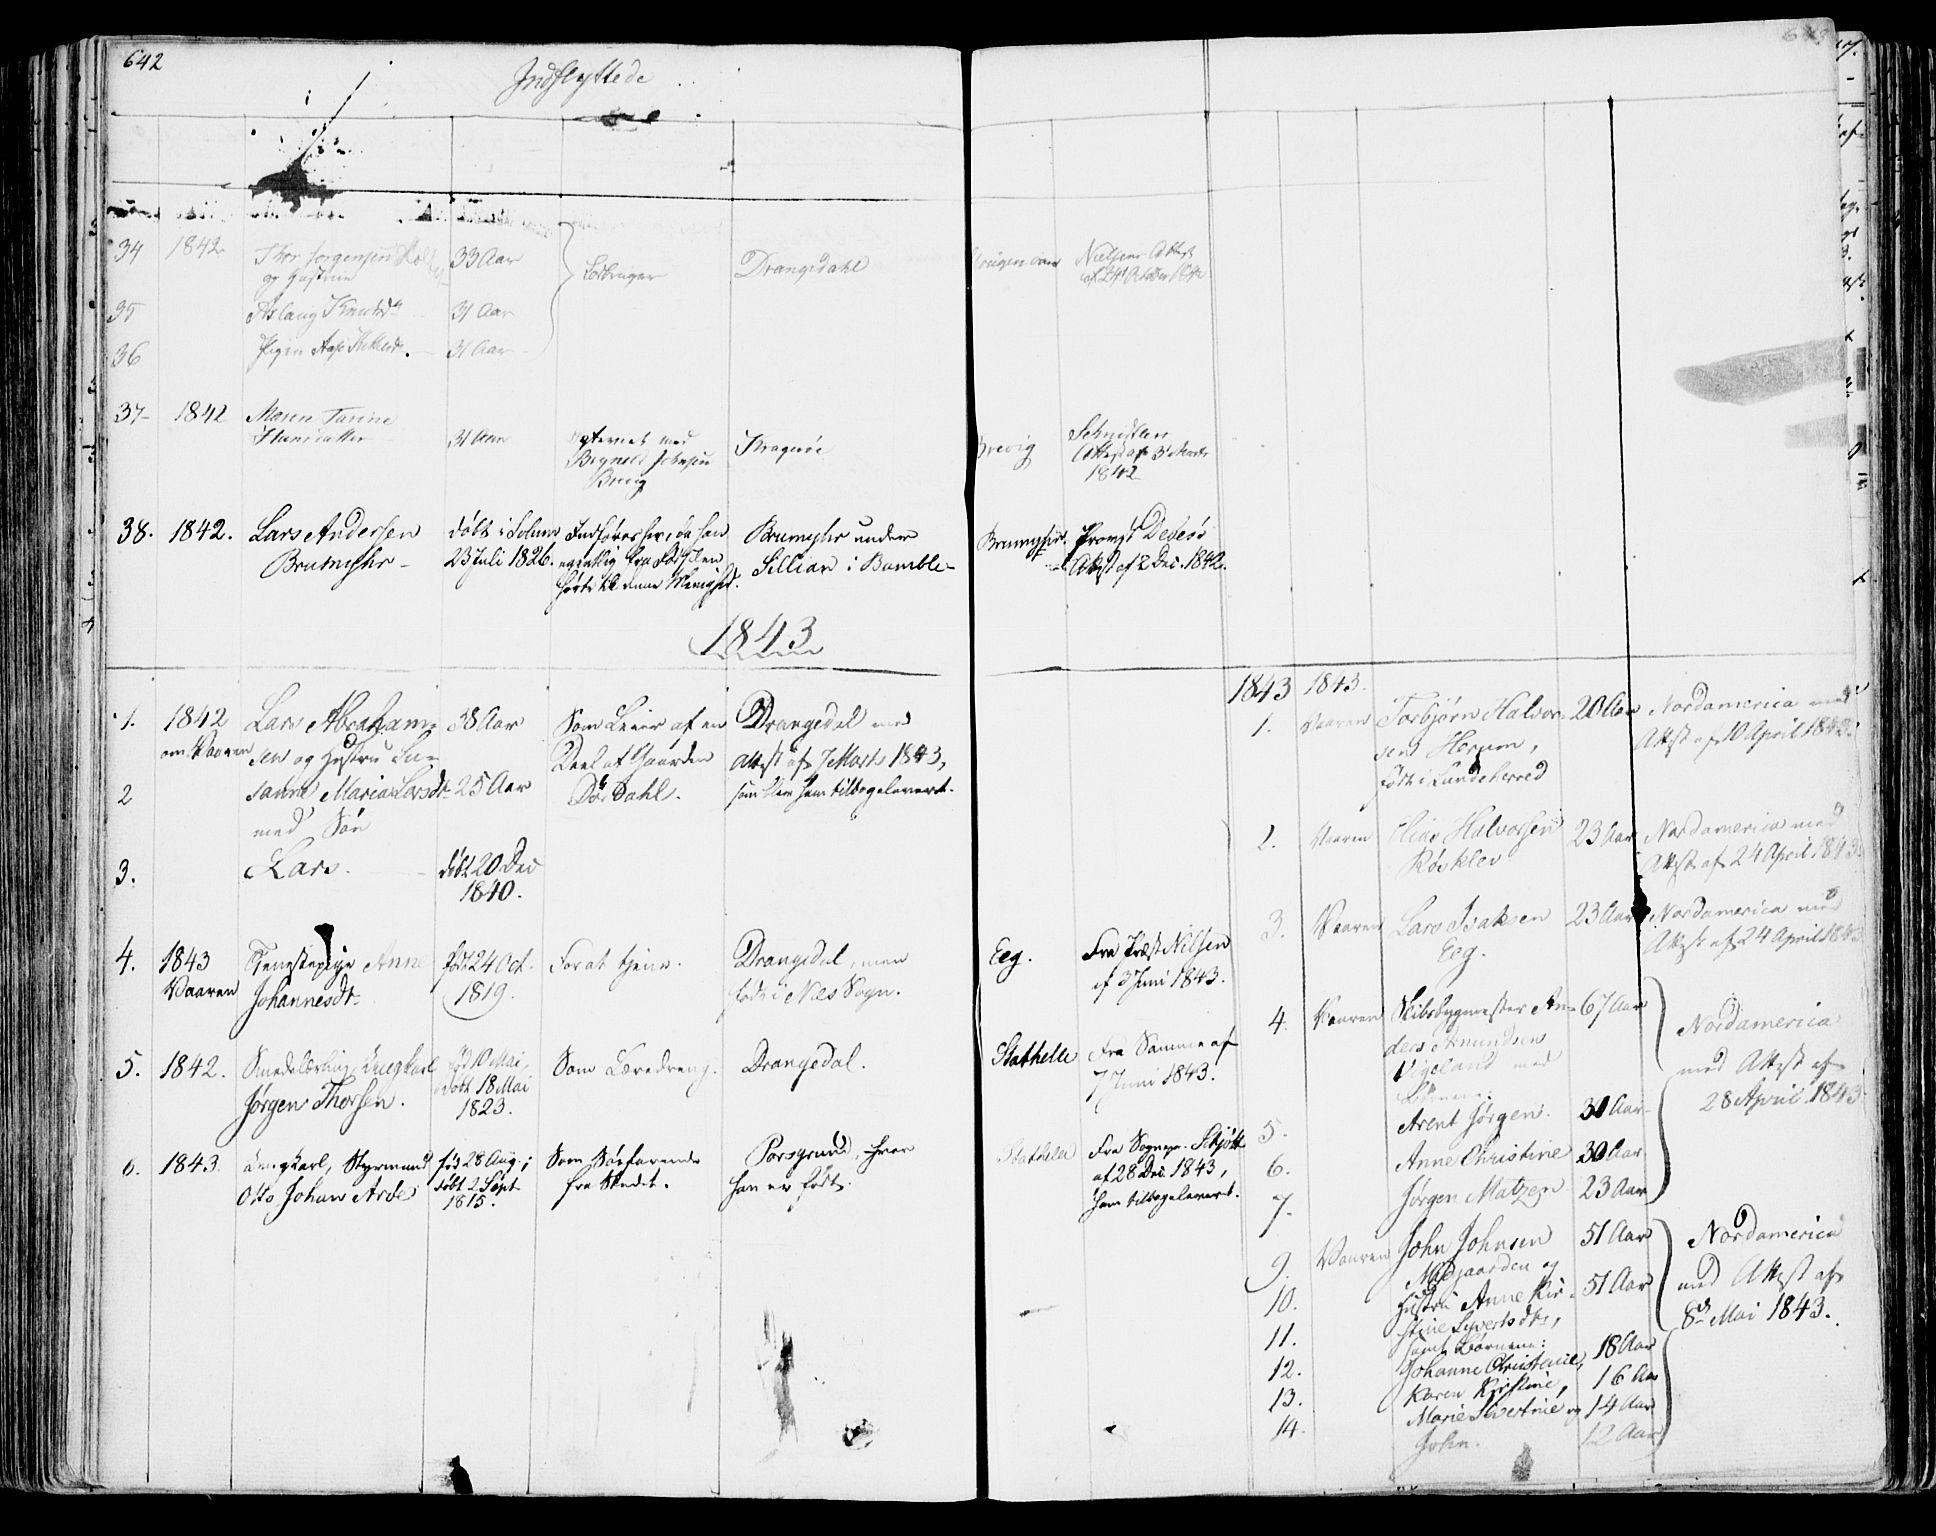 SAKO, Bamble kirkebøker, F/Fa/L0004: Ministerialbok nr. I 4, 1834-1853, s. 642-643